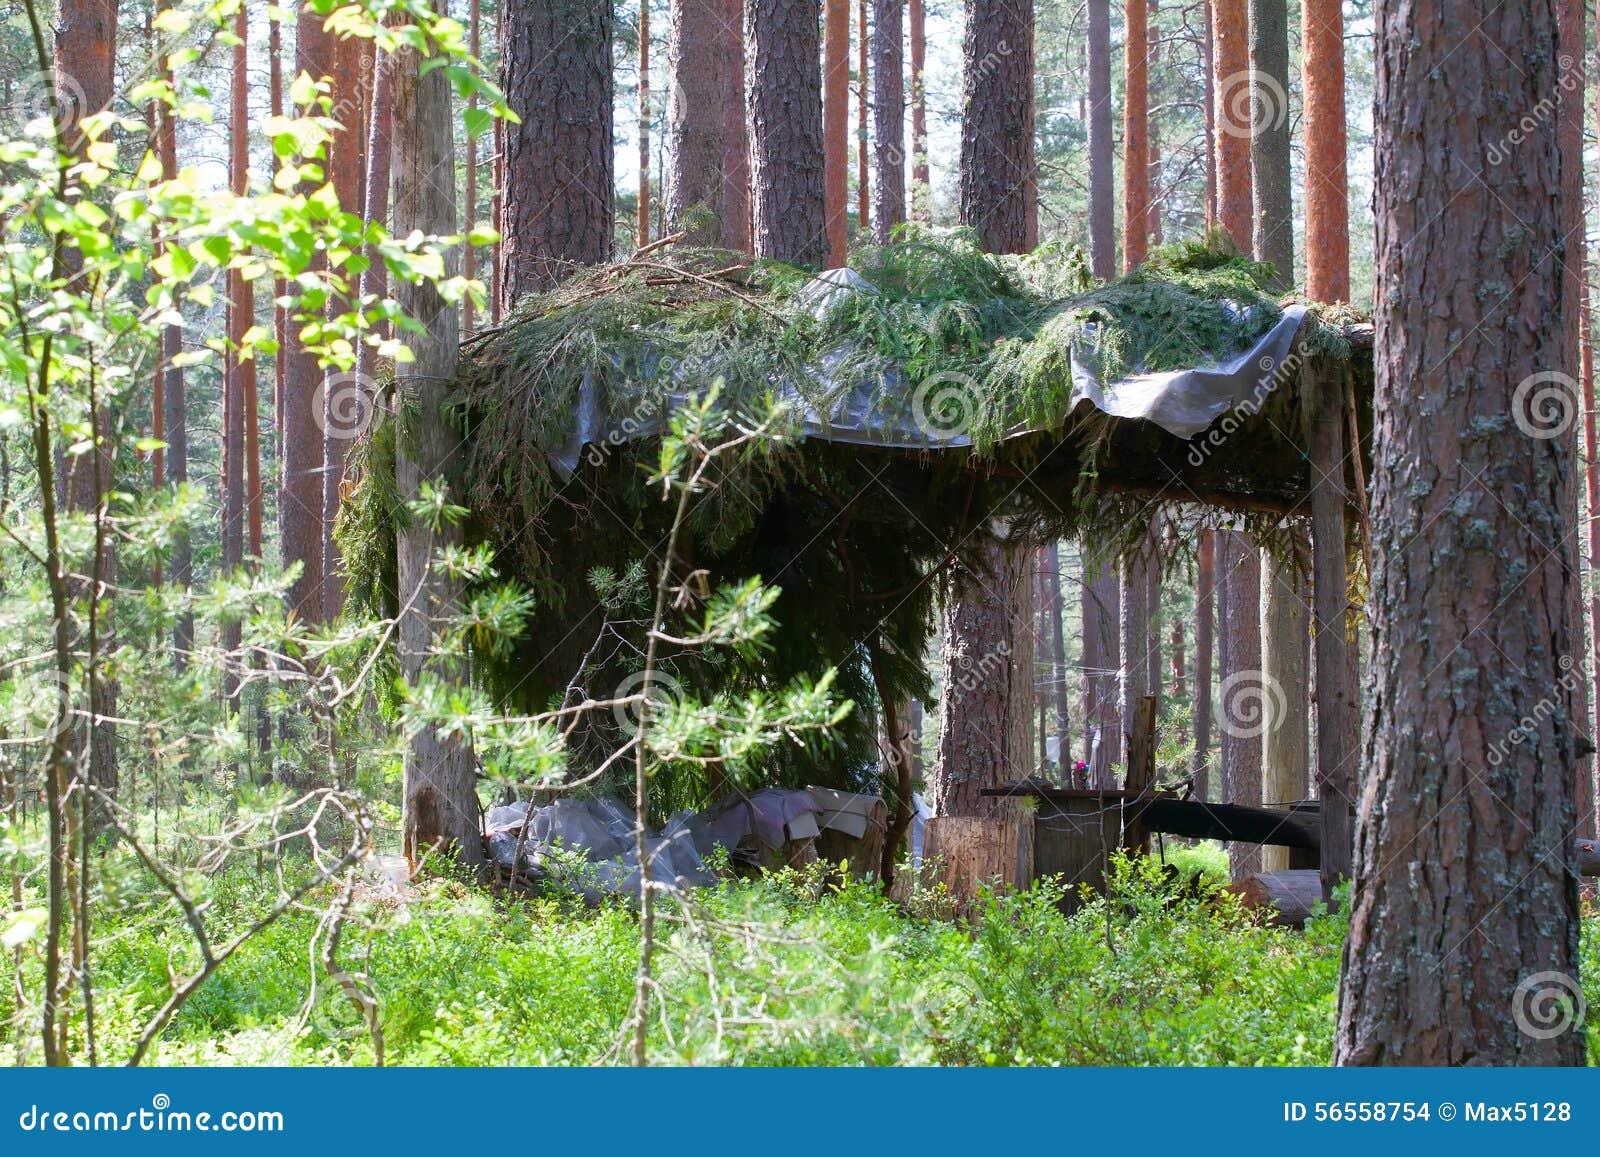 Download Στρατοπέδευση υπαίθρια με τη σκηνή στα ξύλα το καλοκαίρι Στοκ Εικόνες - εικόνα από leisure, φύση: 56558754